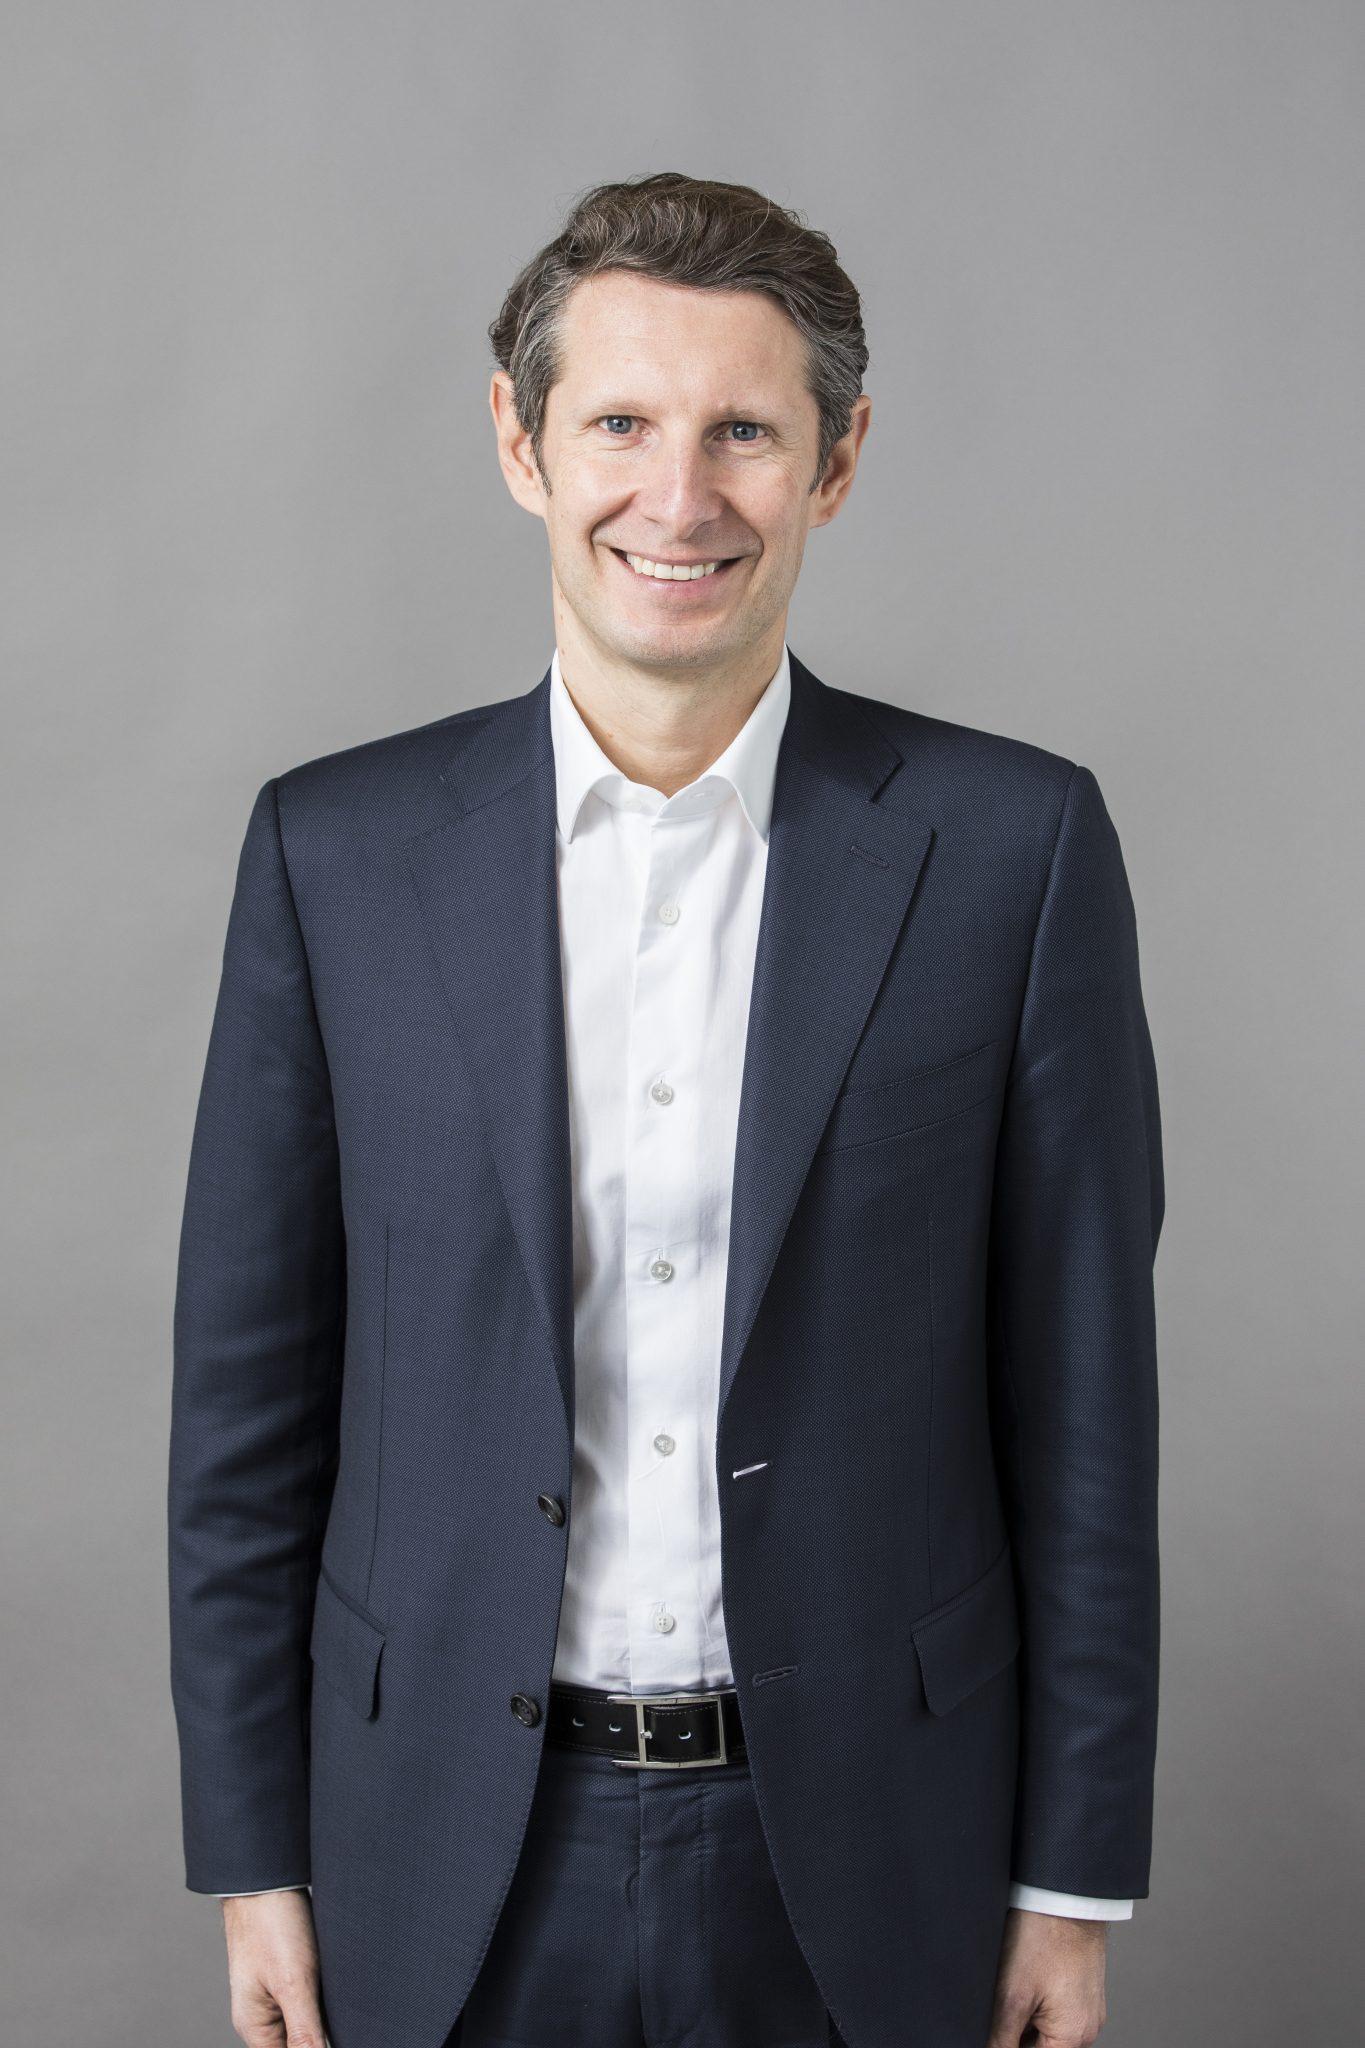 Max Chuard - new CEO on the way